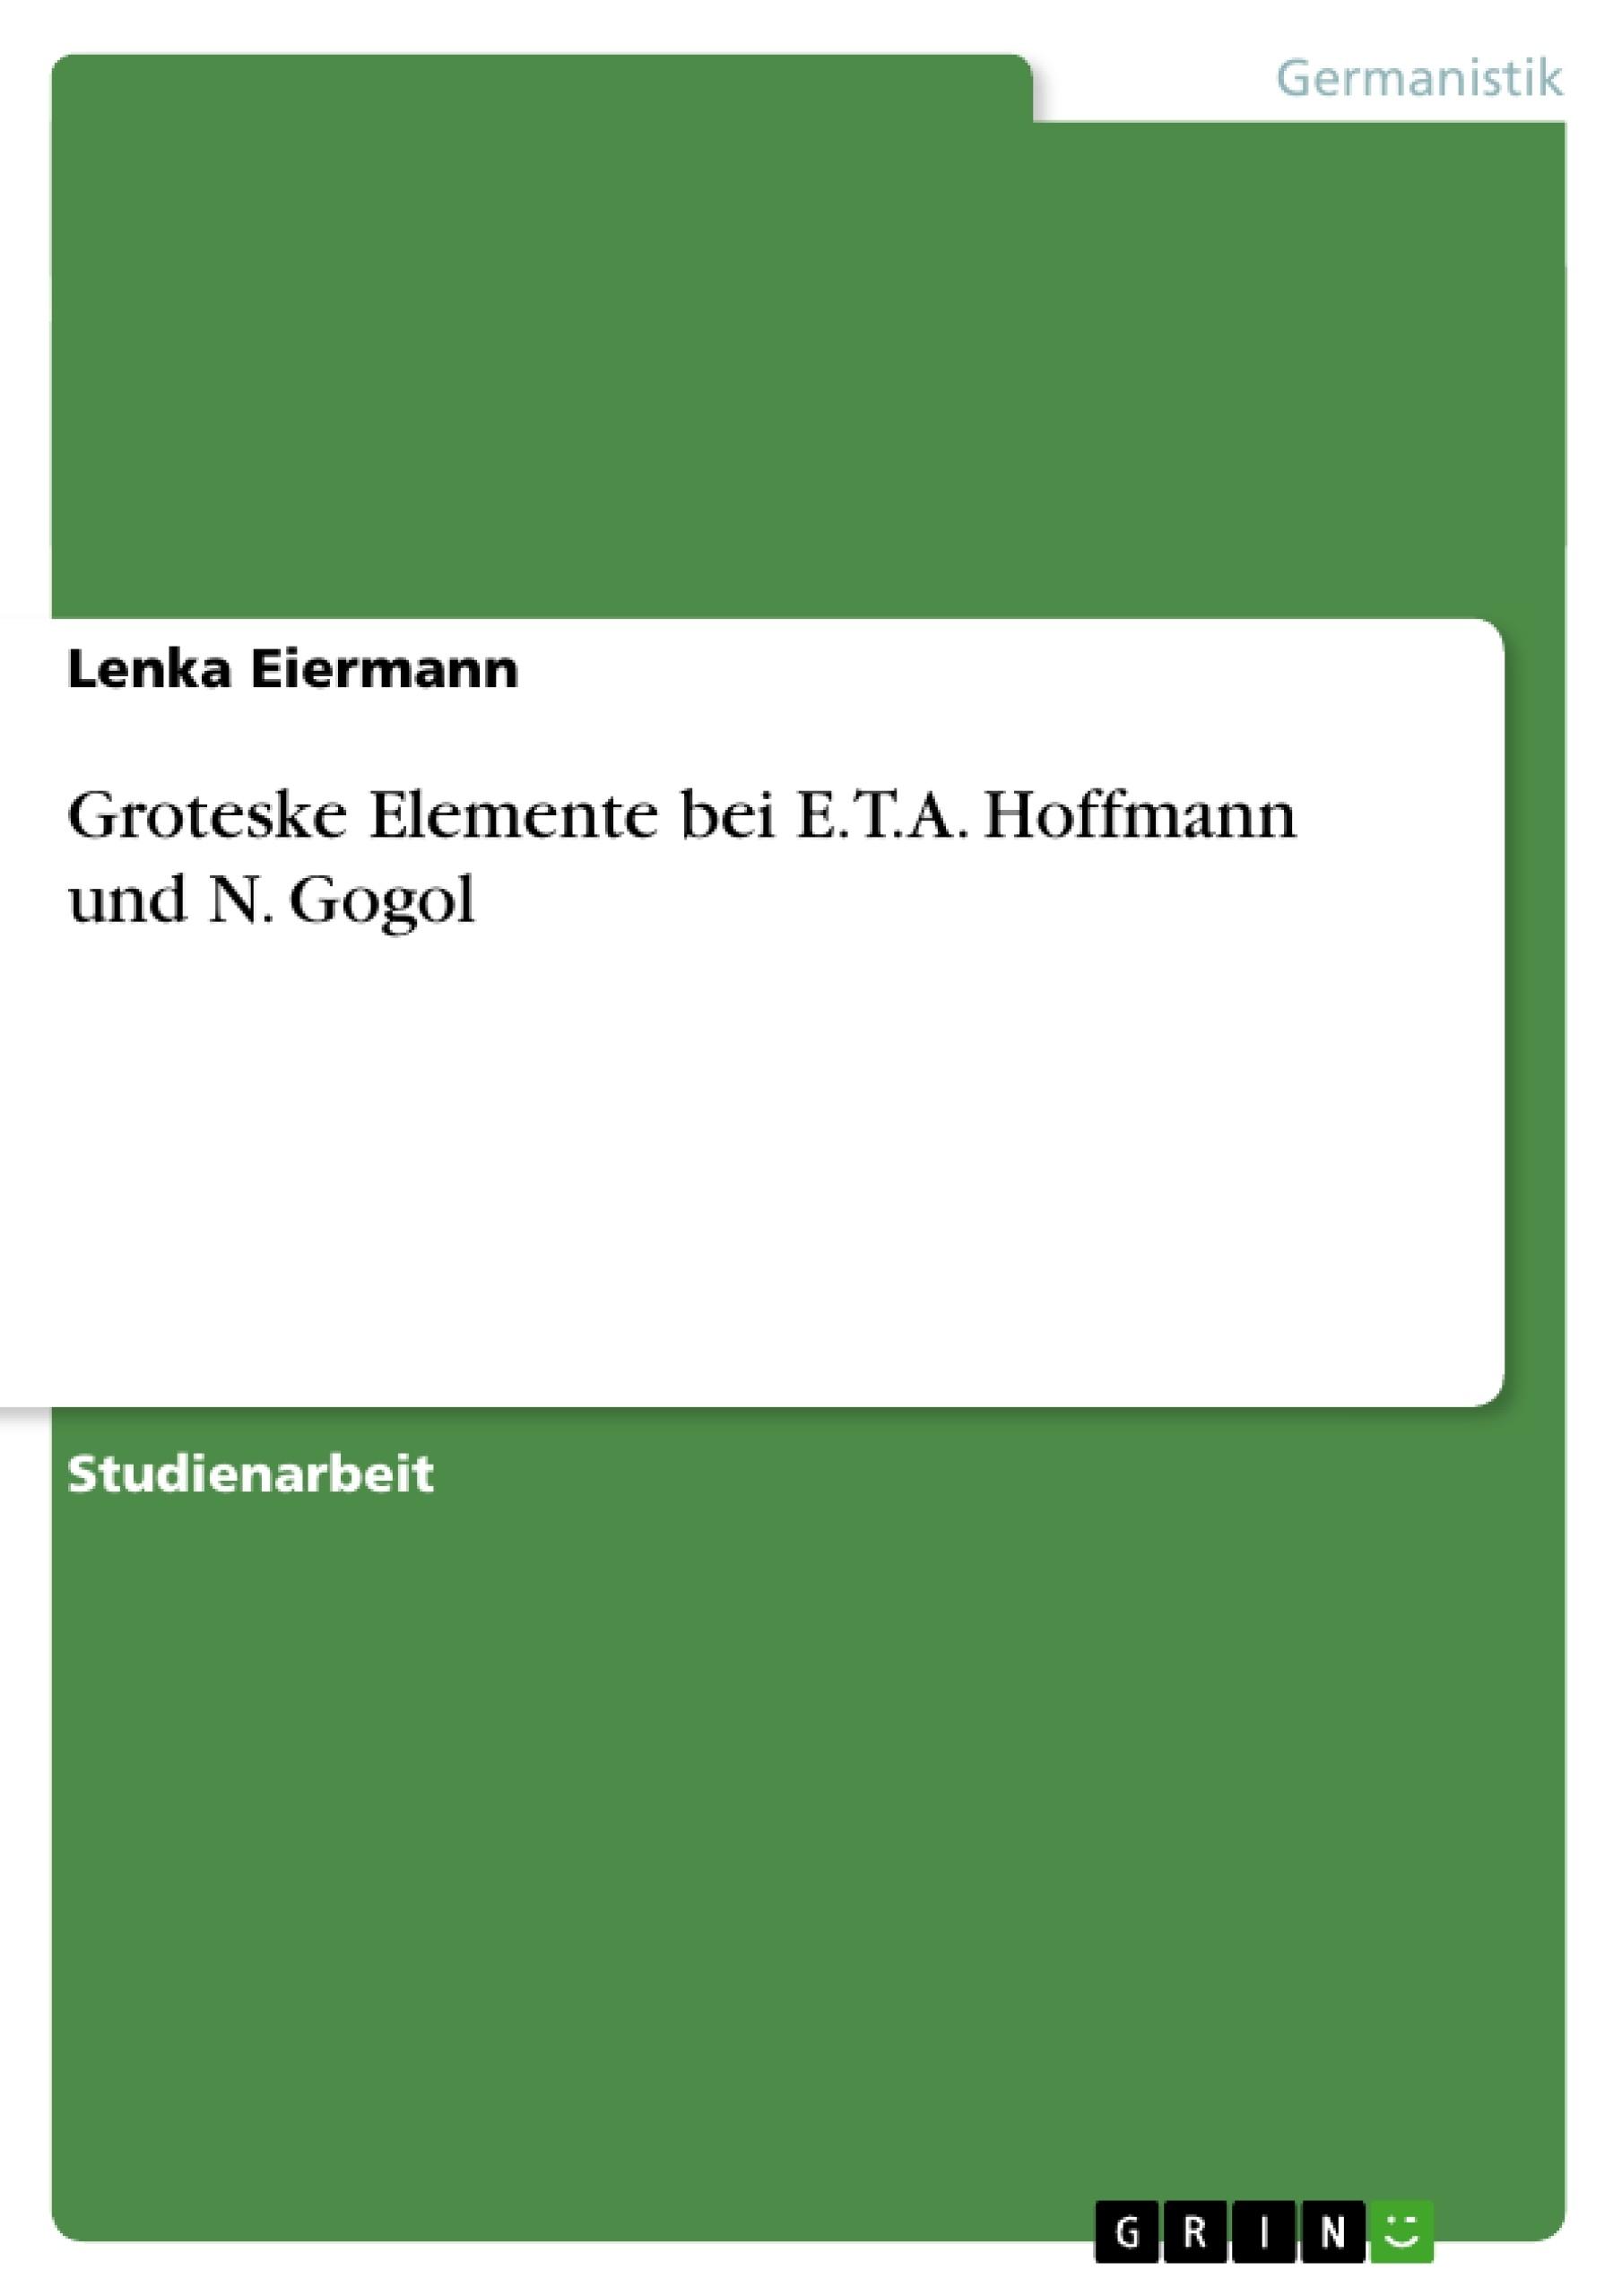 Titel: Groteske Elemente bei E.T.A. Hoffmann und N. Gogol